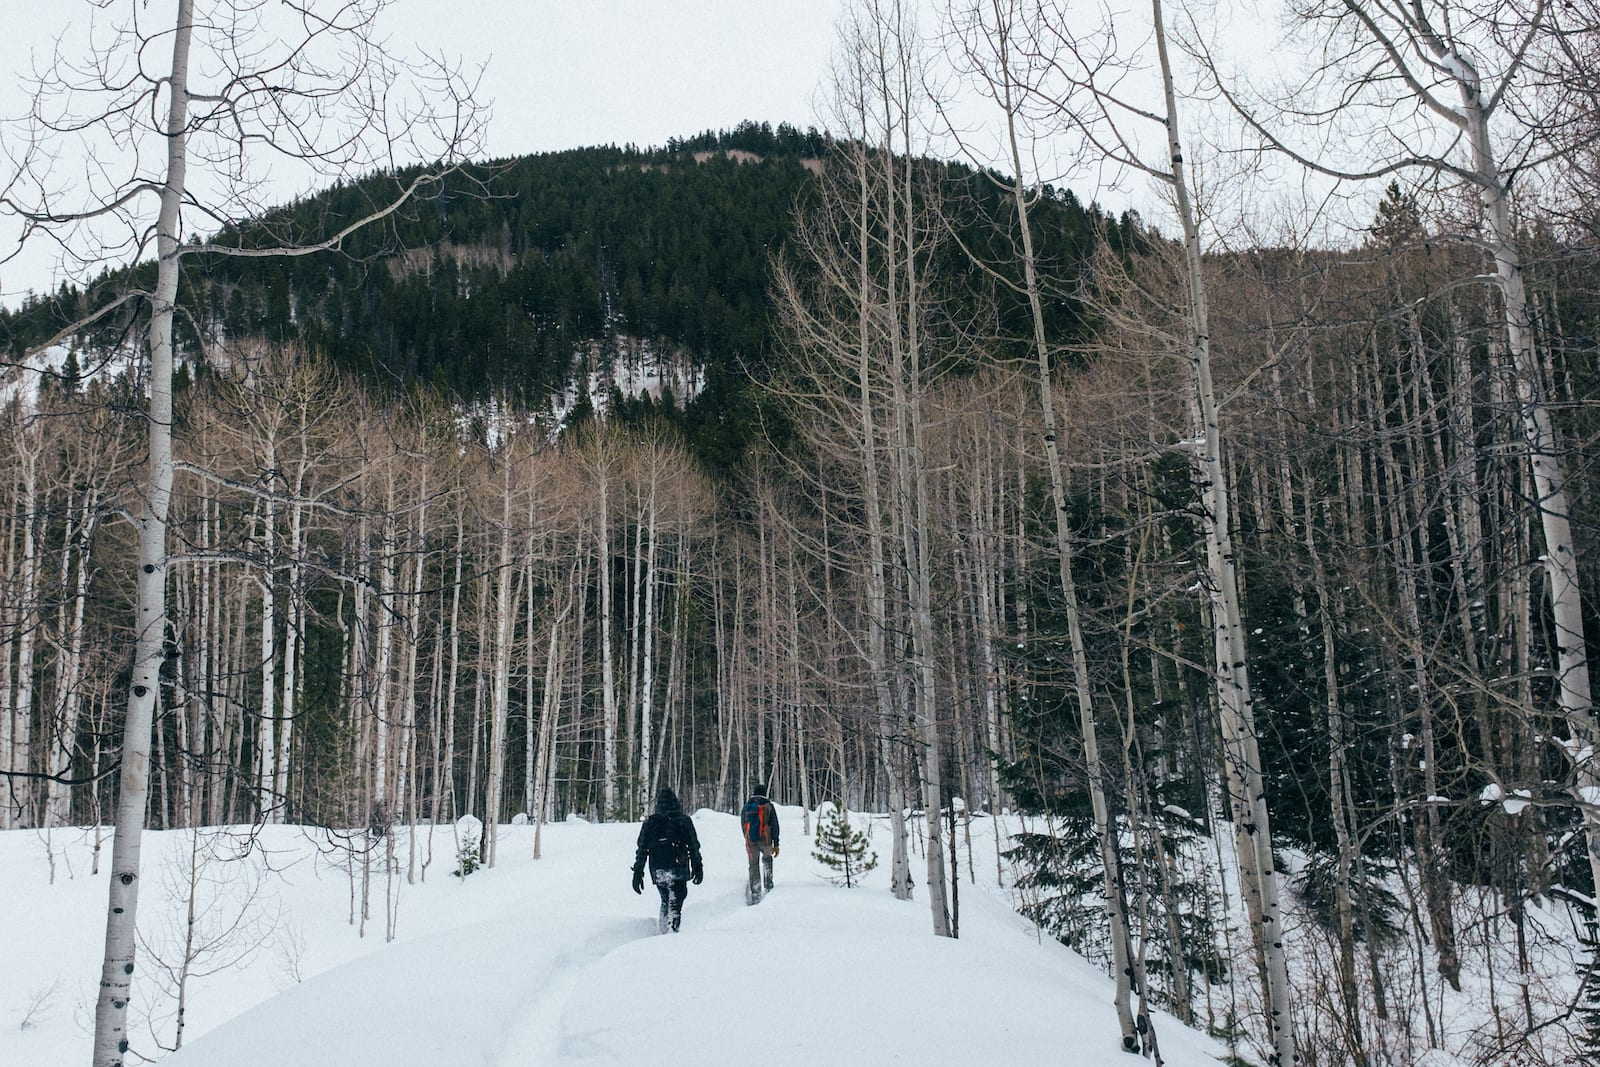 Penyelundup Sepatu Salju Jejak Gunung Aspen CO